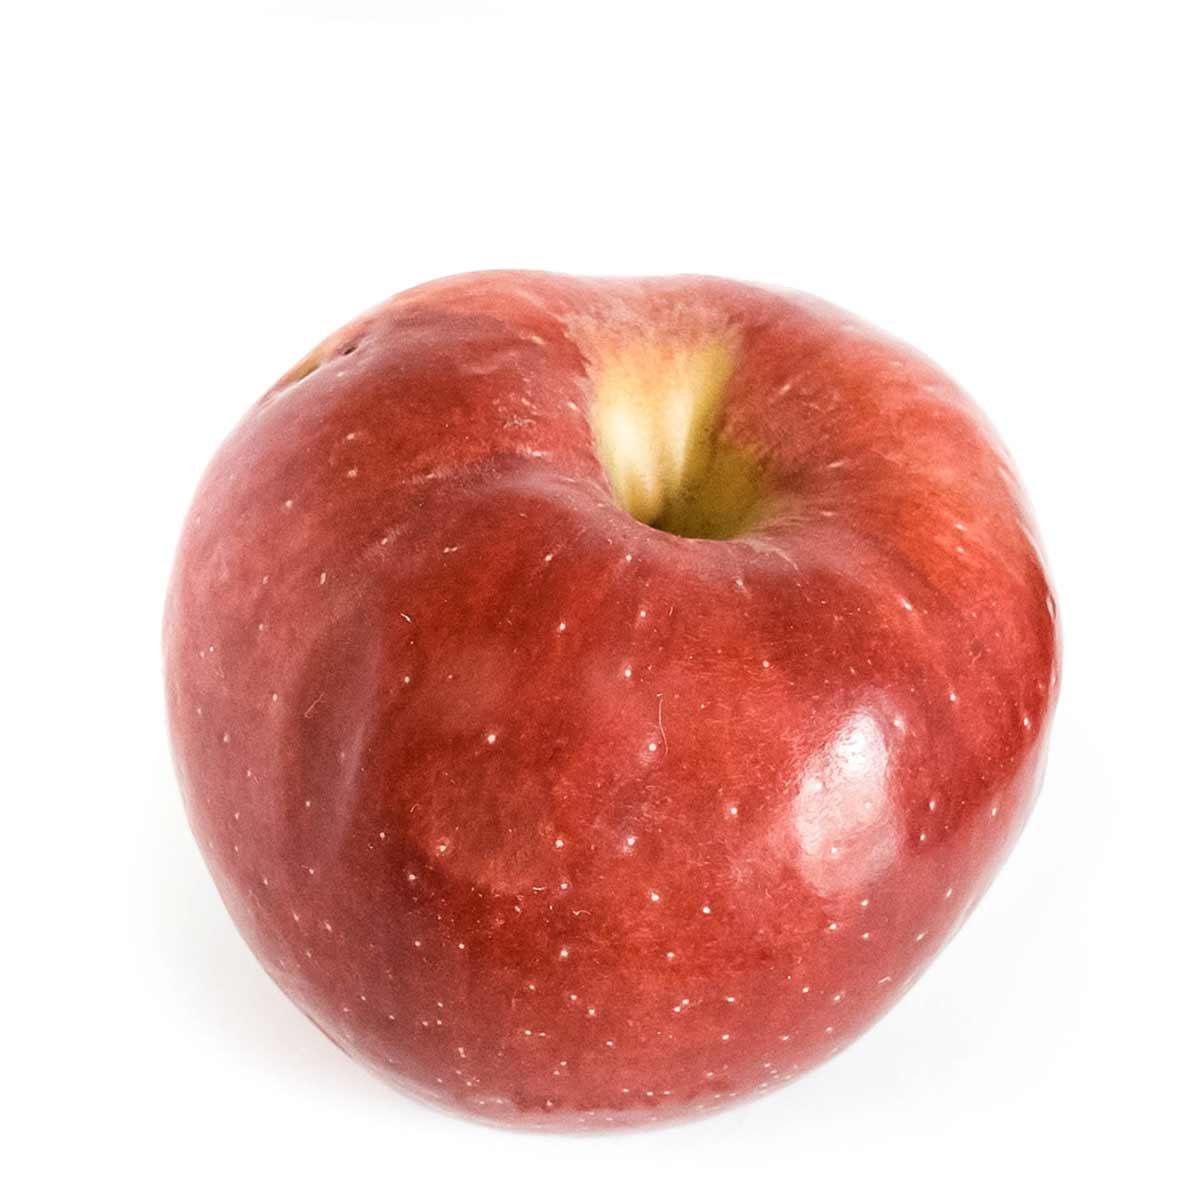 Mollie apple